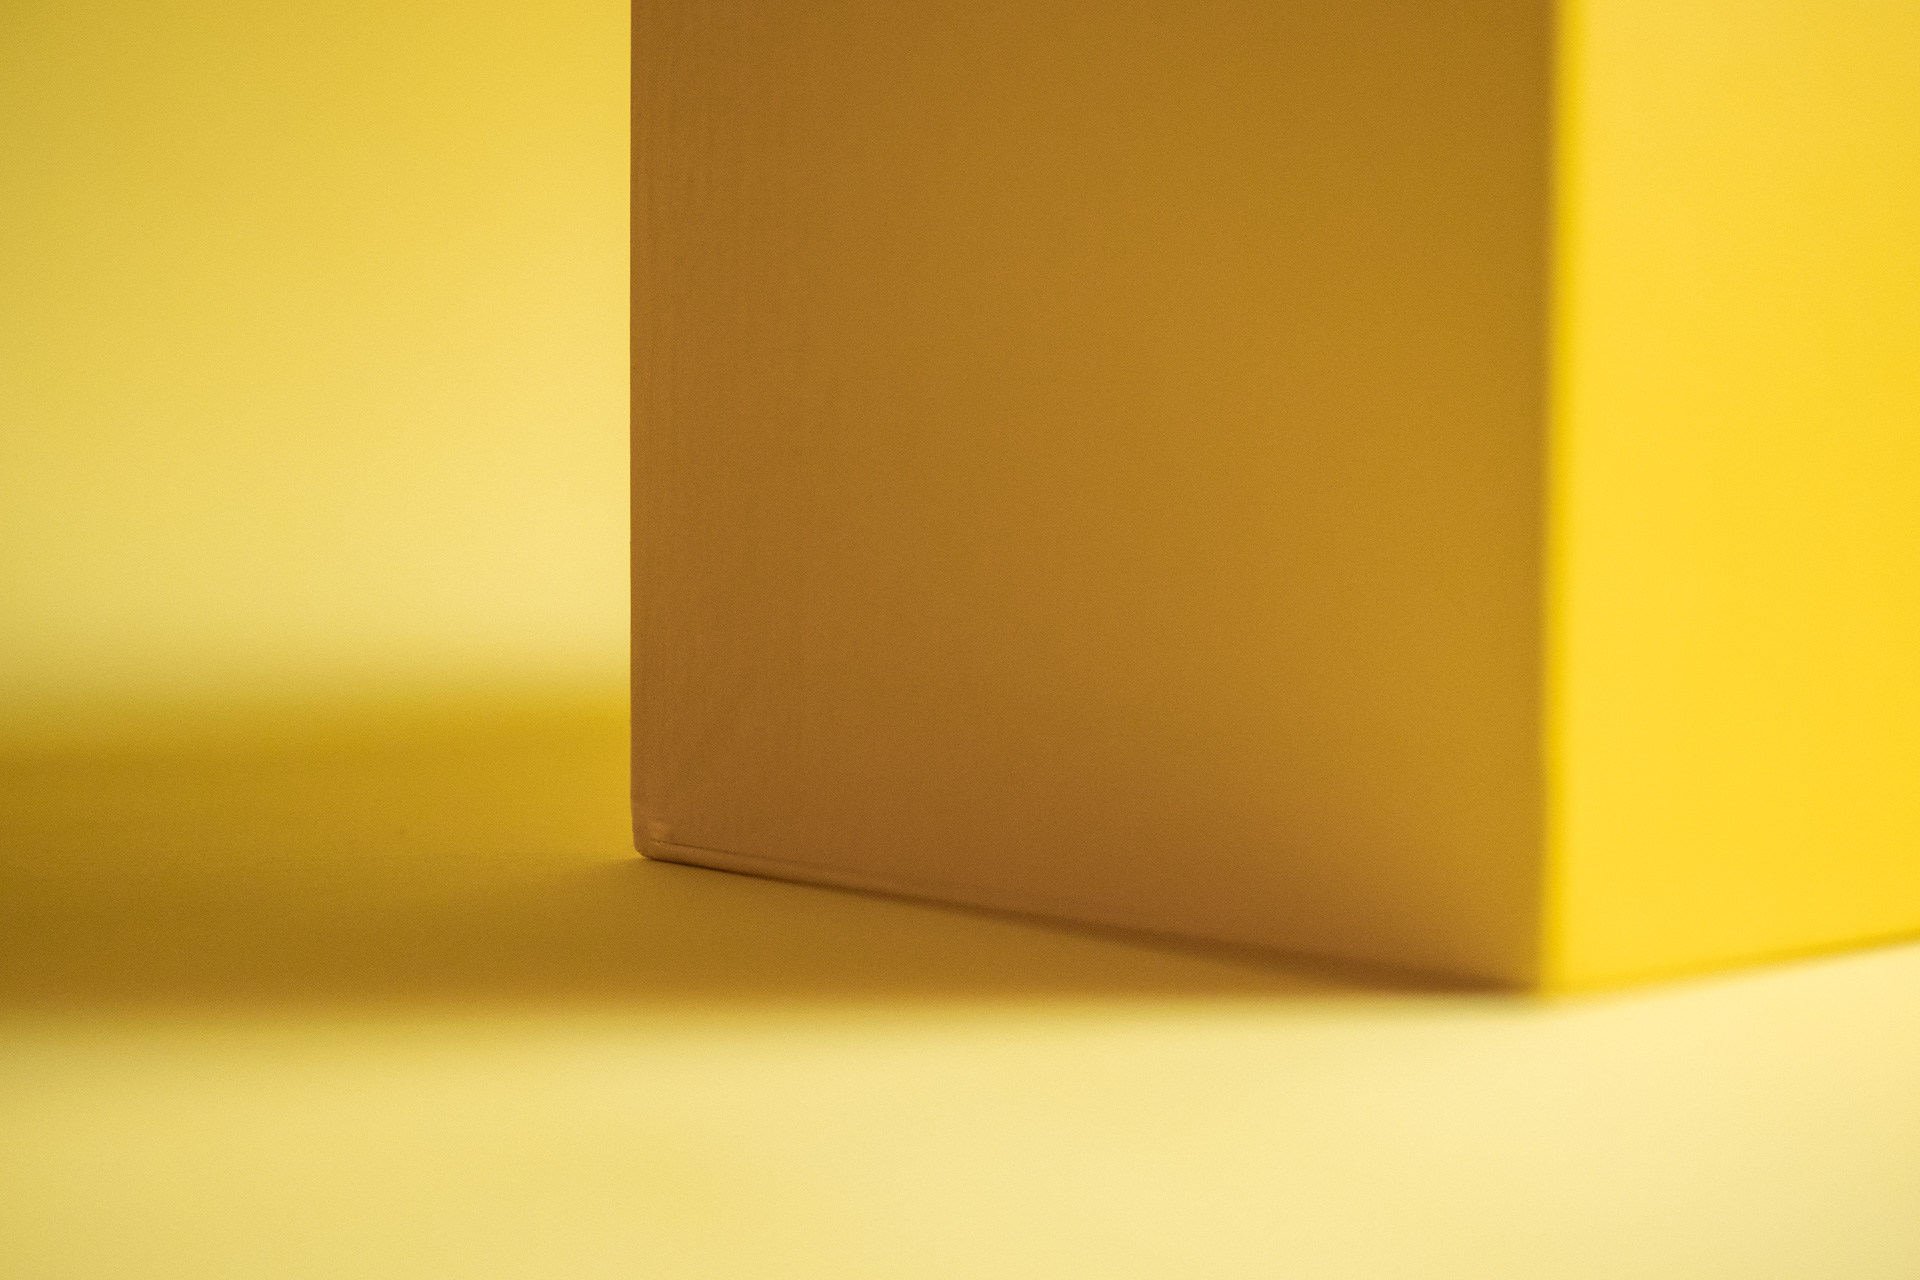 BPP 09 - Jabra Elite 85h Packaging IG-7.jpg